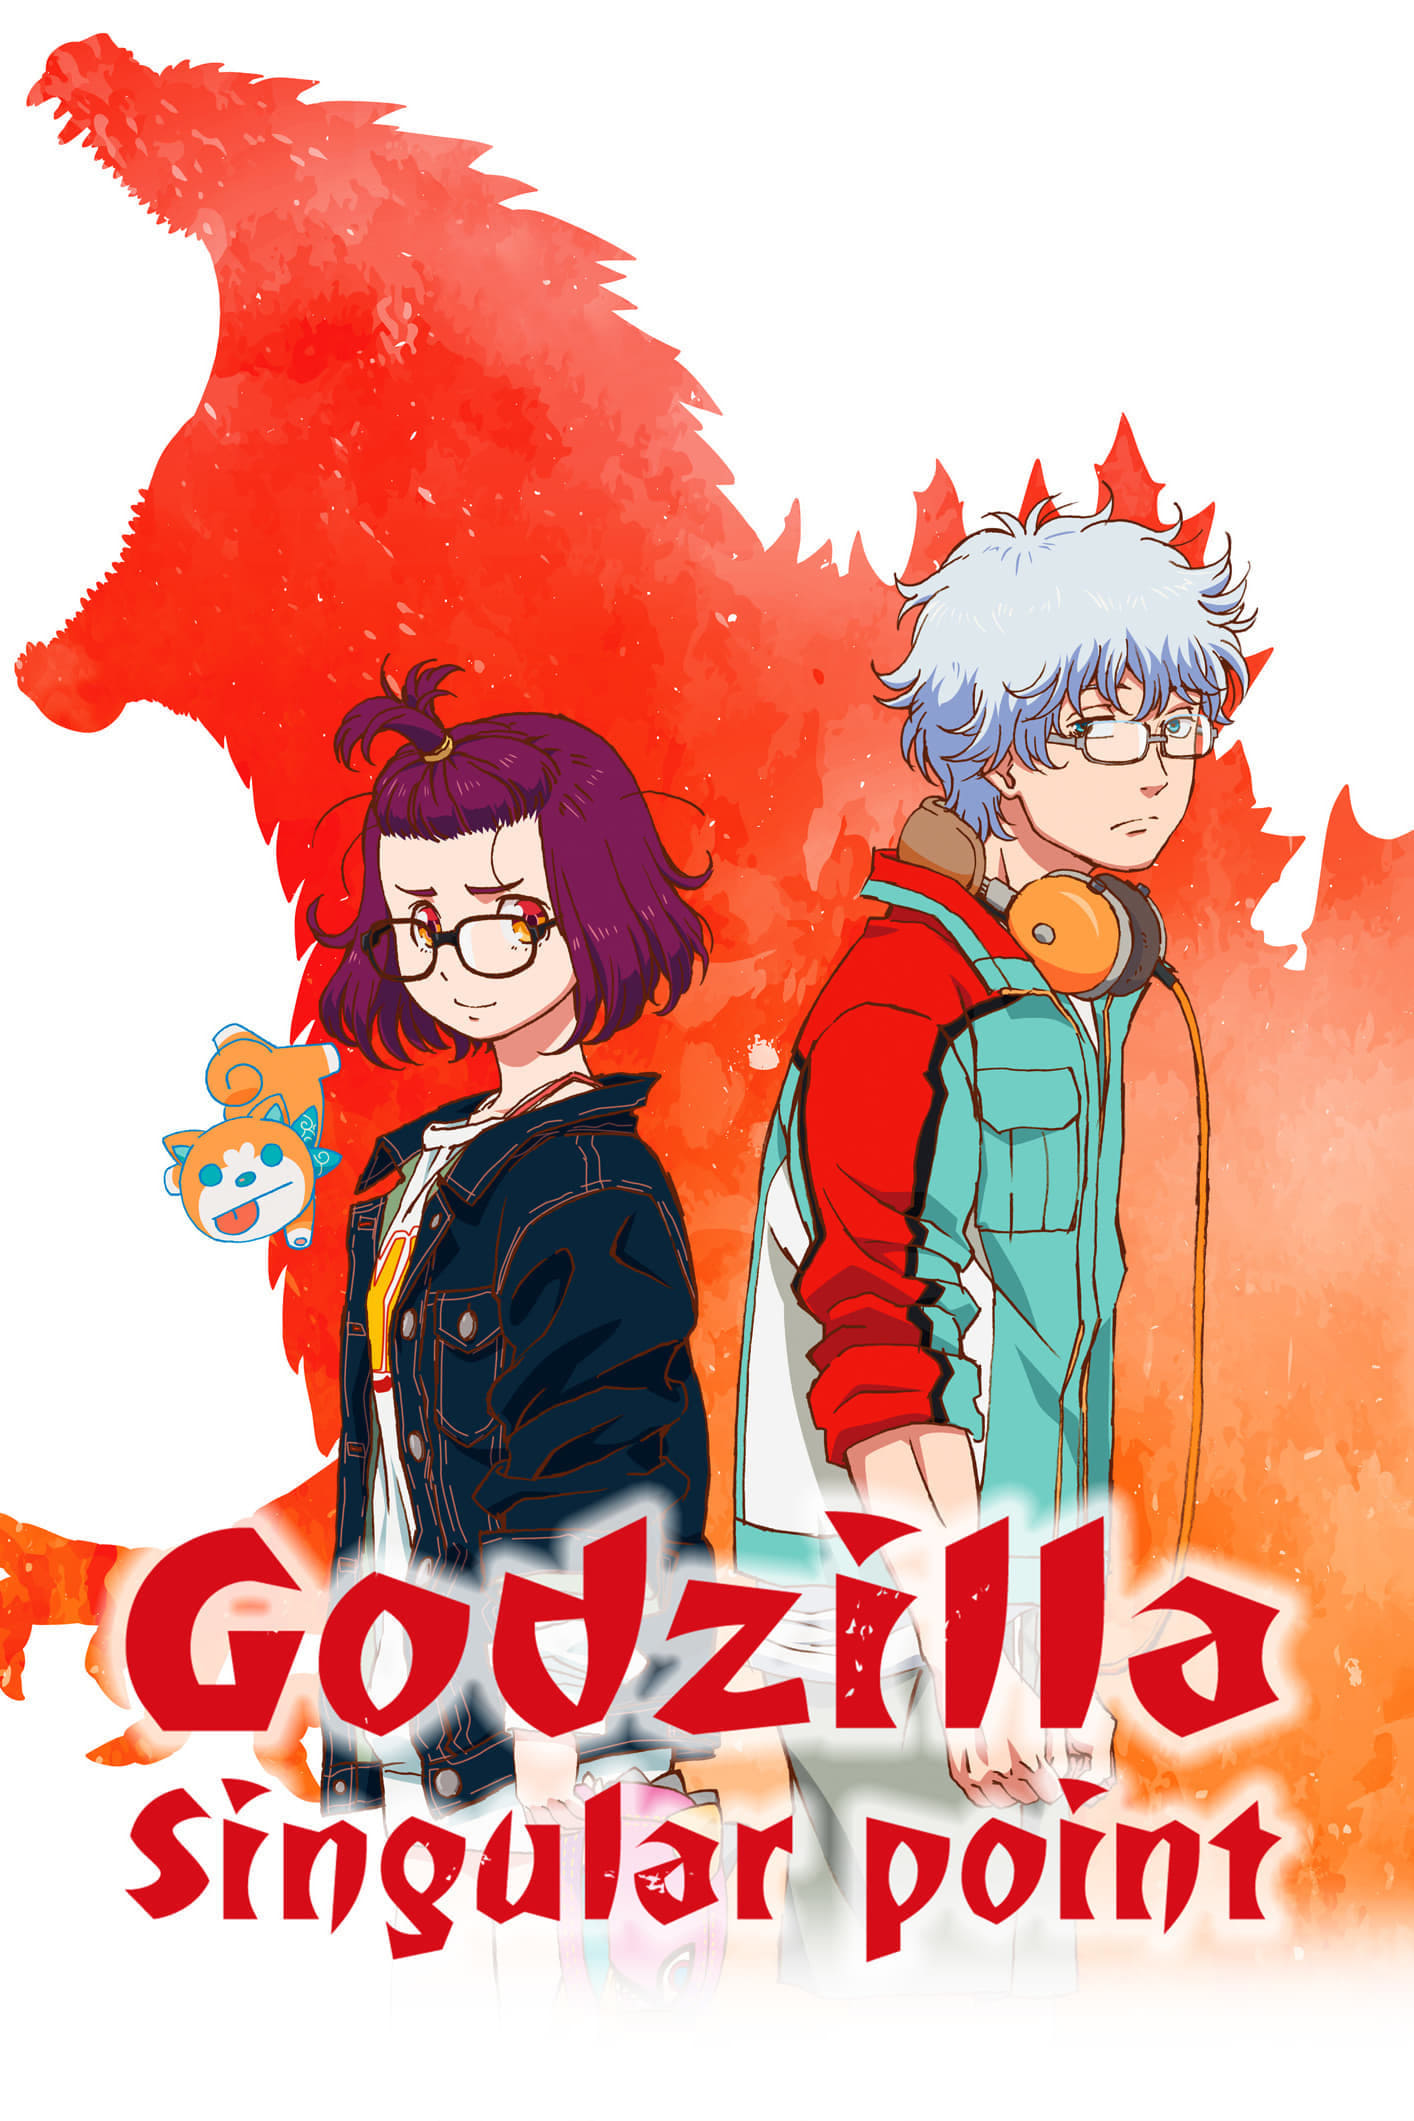 Godzilla Singular Point Season 1